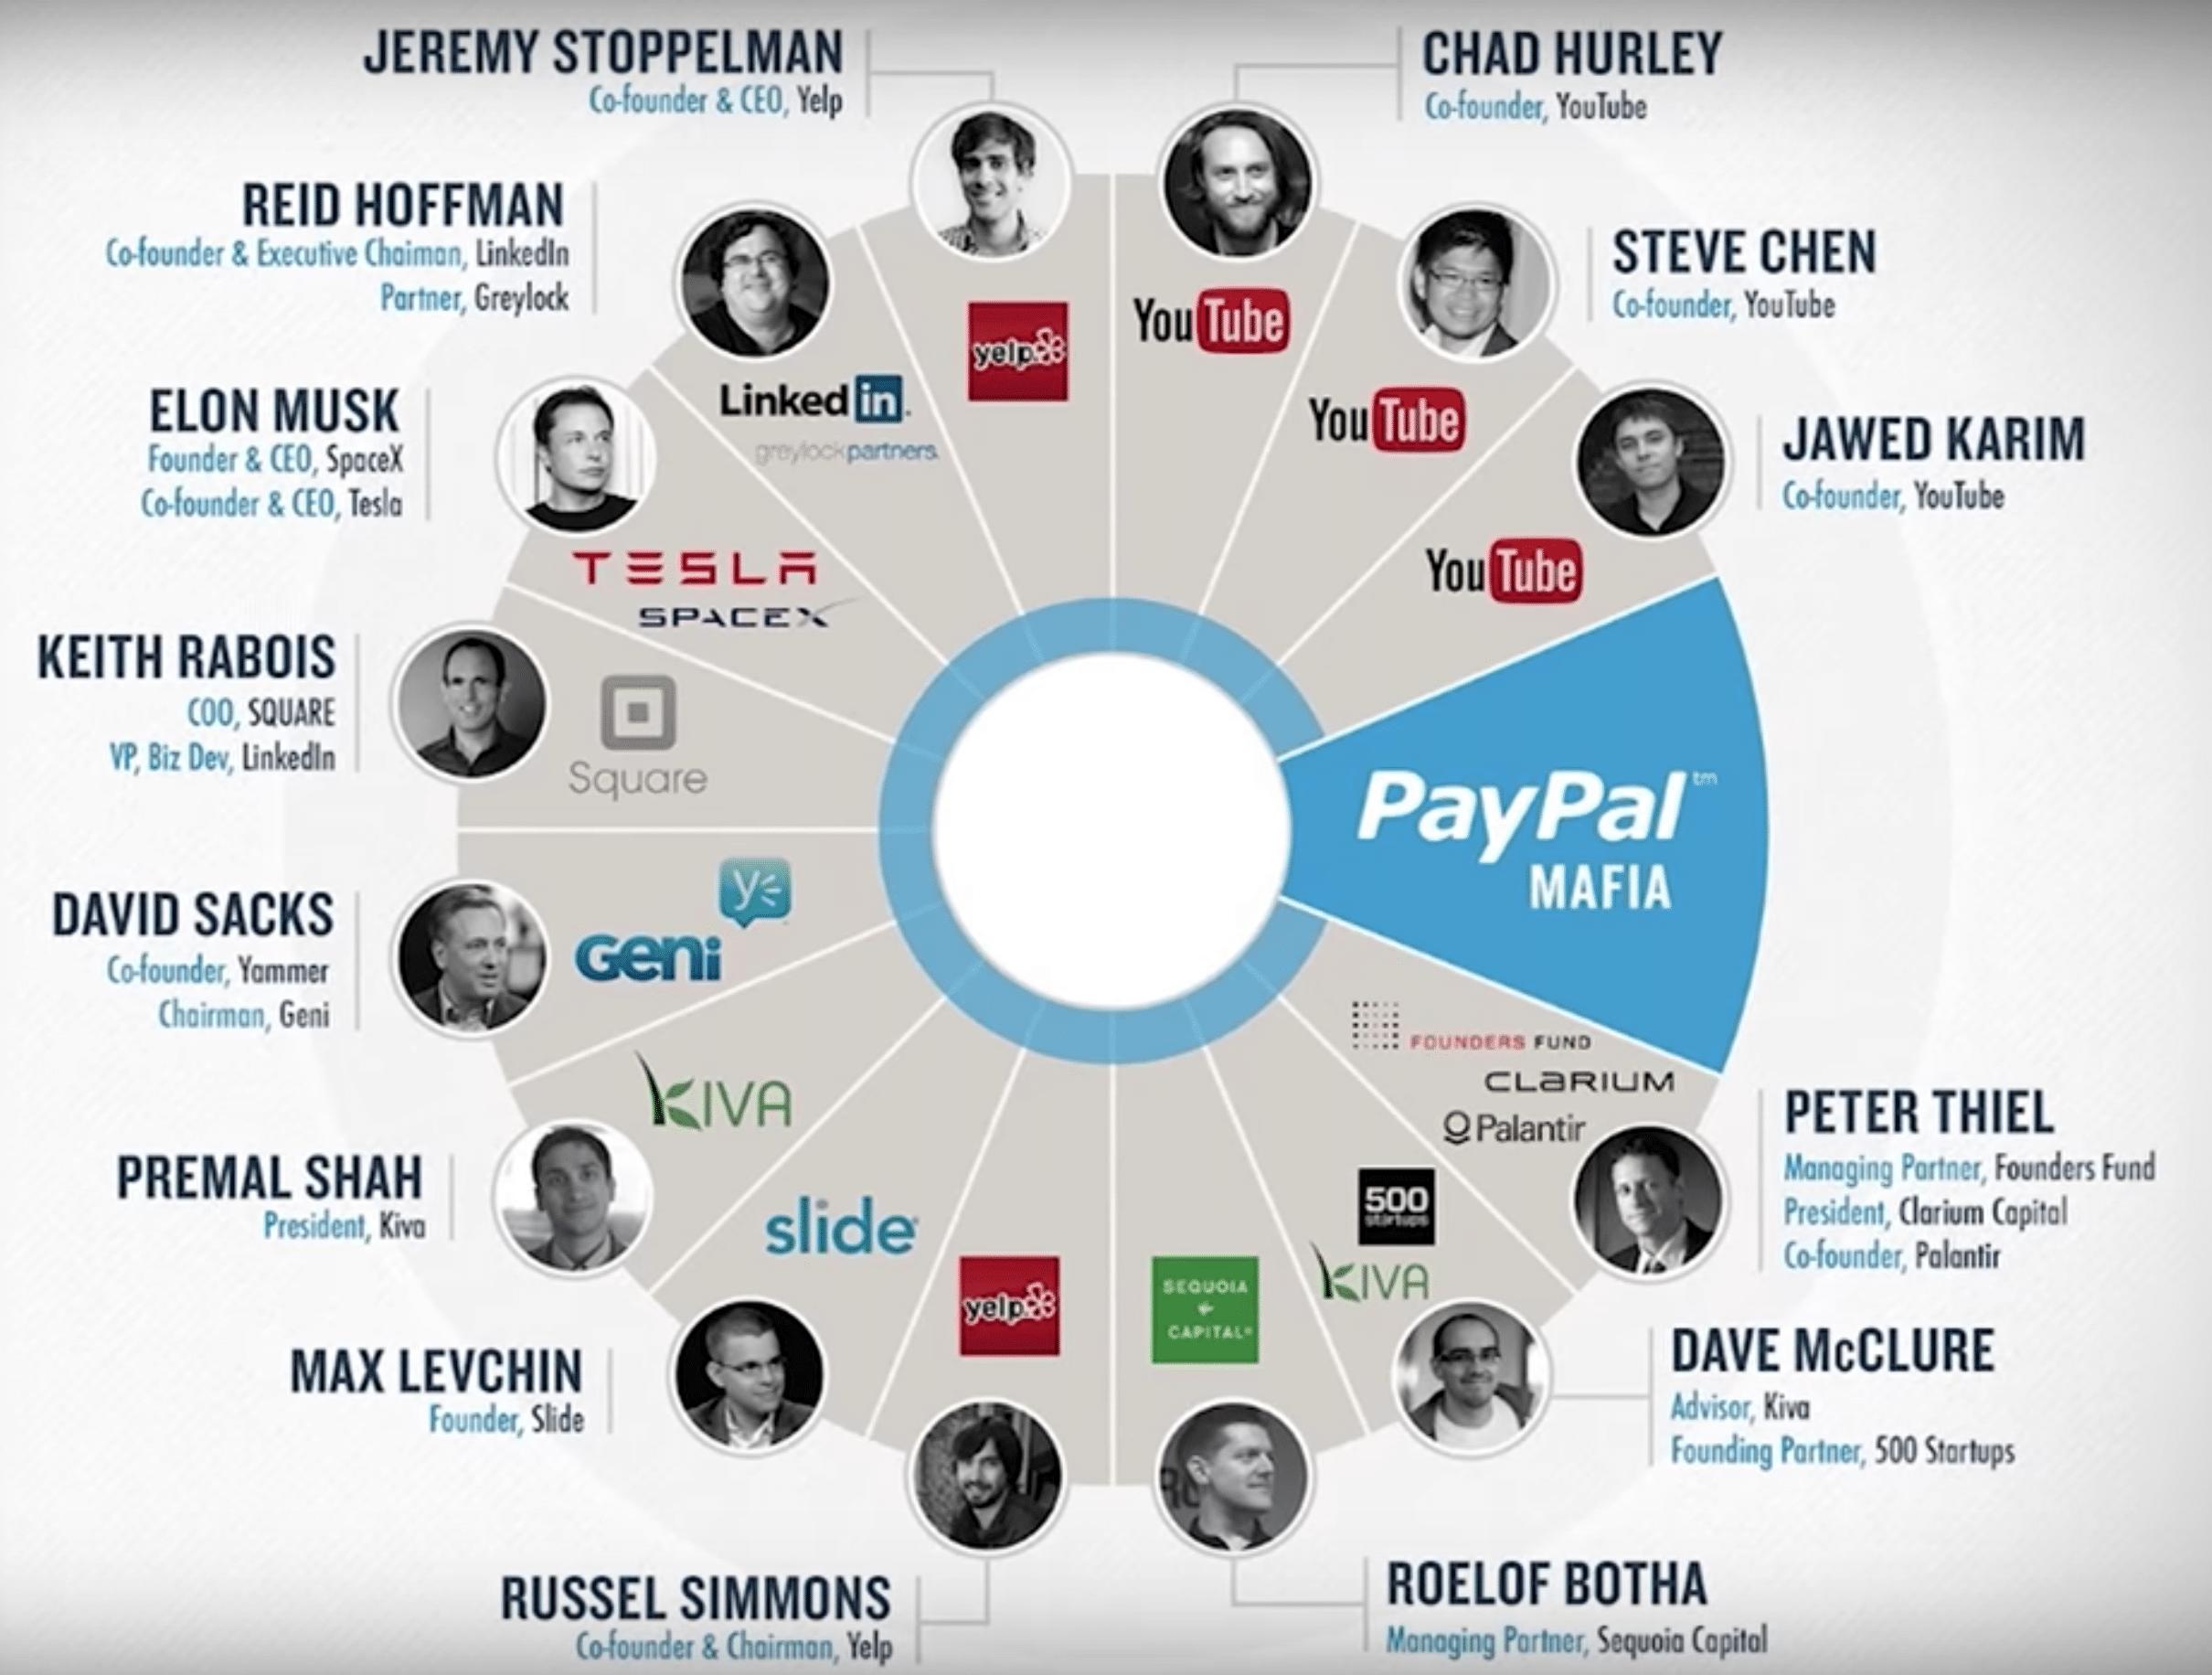 Die PayPal-Mafia